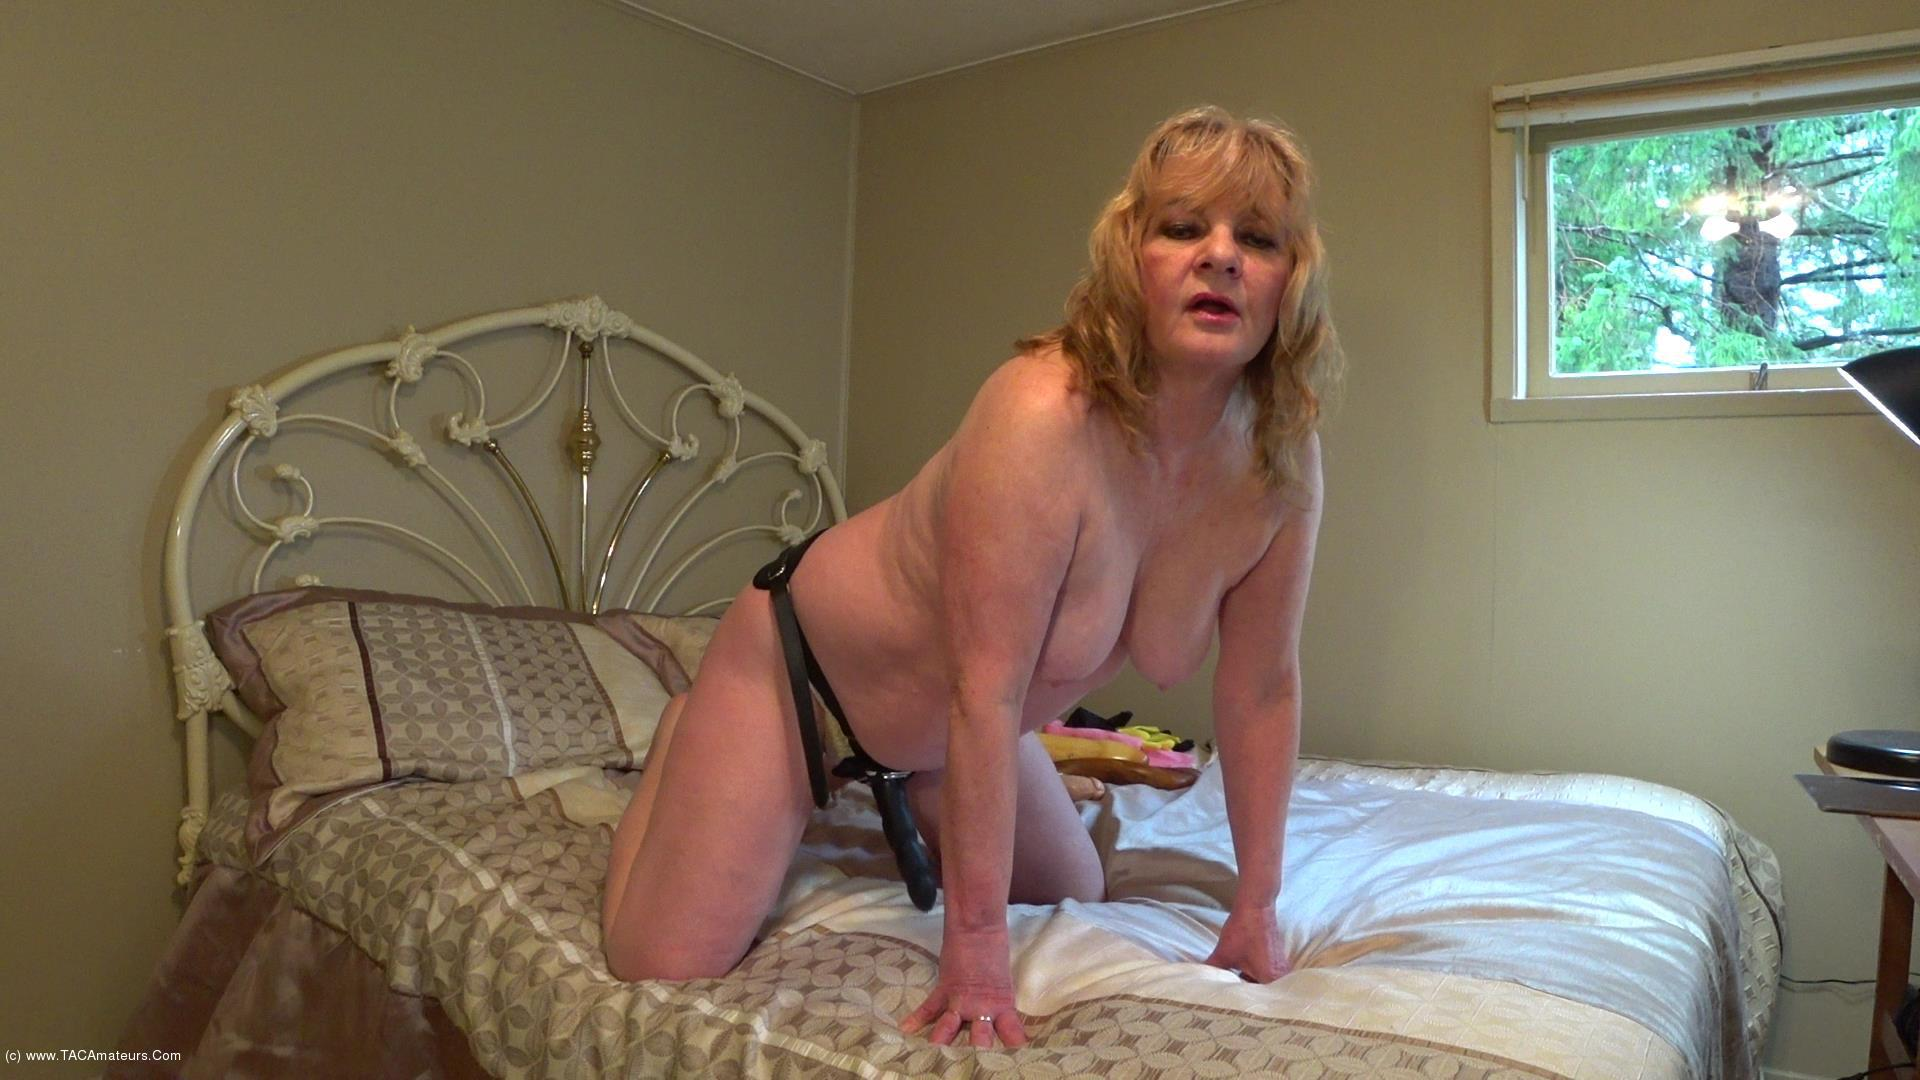 CougarBabeJolee - Sissy Boy Strap-on scene 3